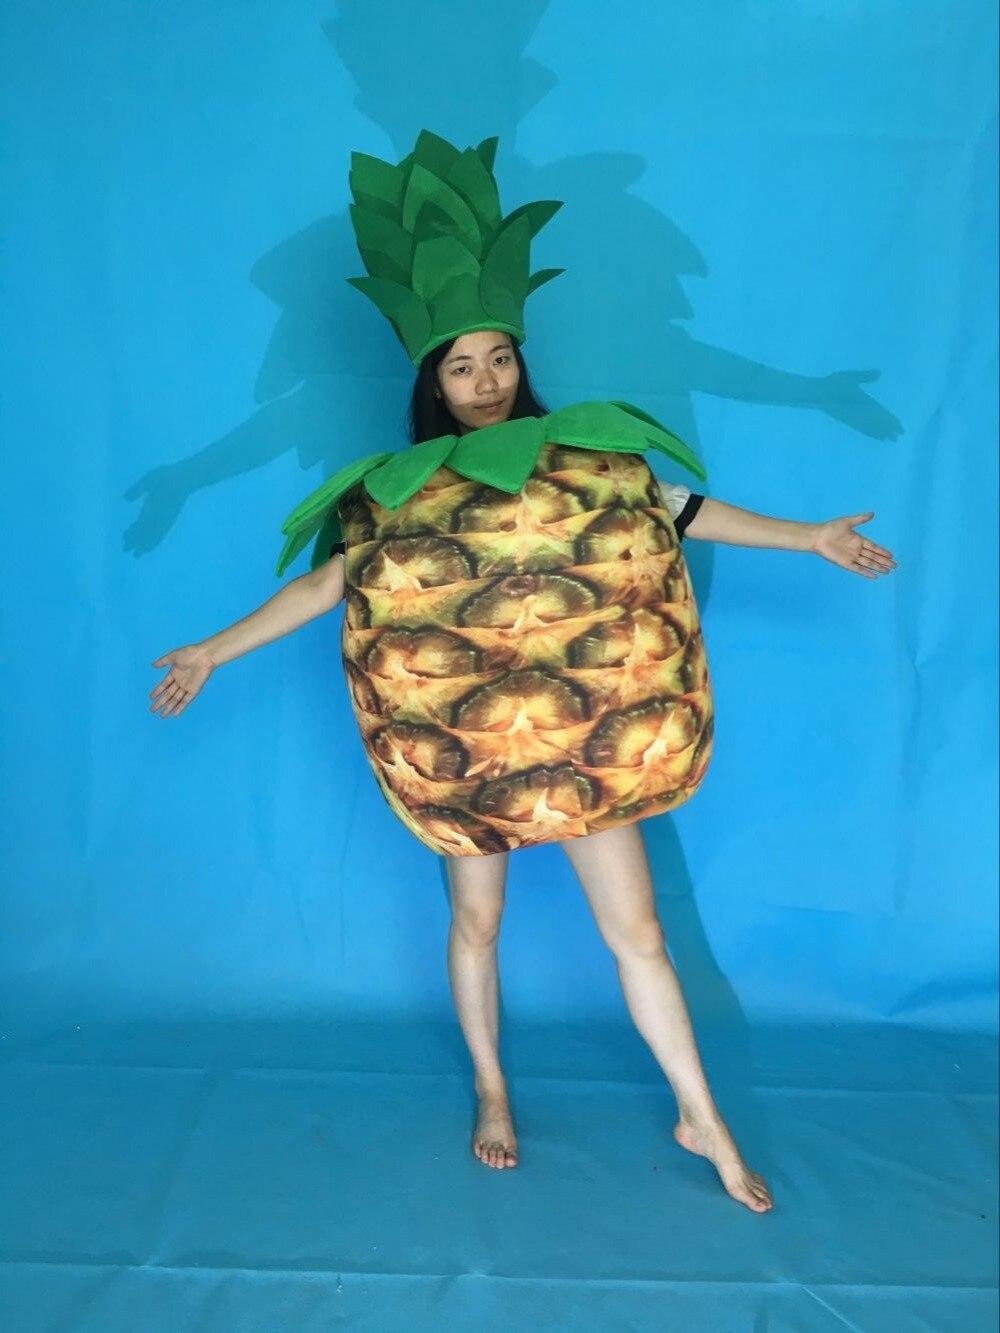 Hot Sale Professional Mascot Costume Adult Size Banana grape watermelon pineapple apple fruit Mascot Costume Halloween Christmas - 5